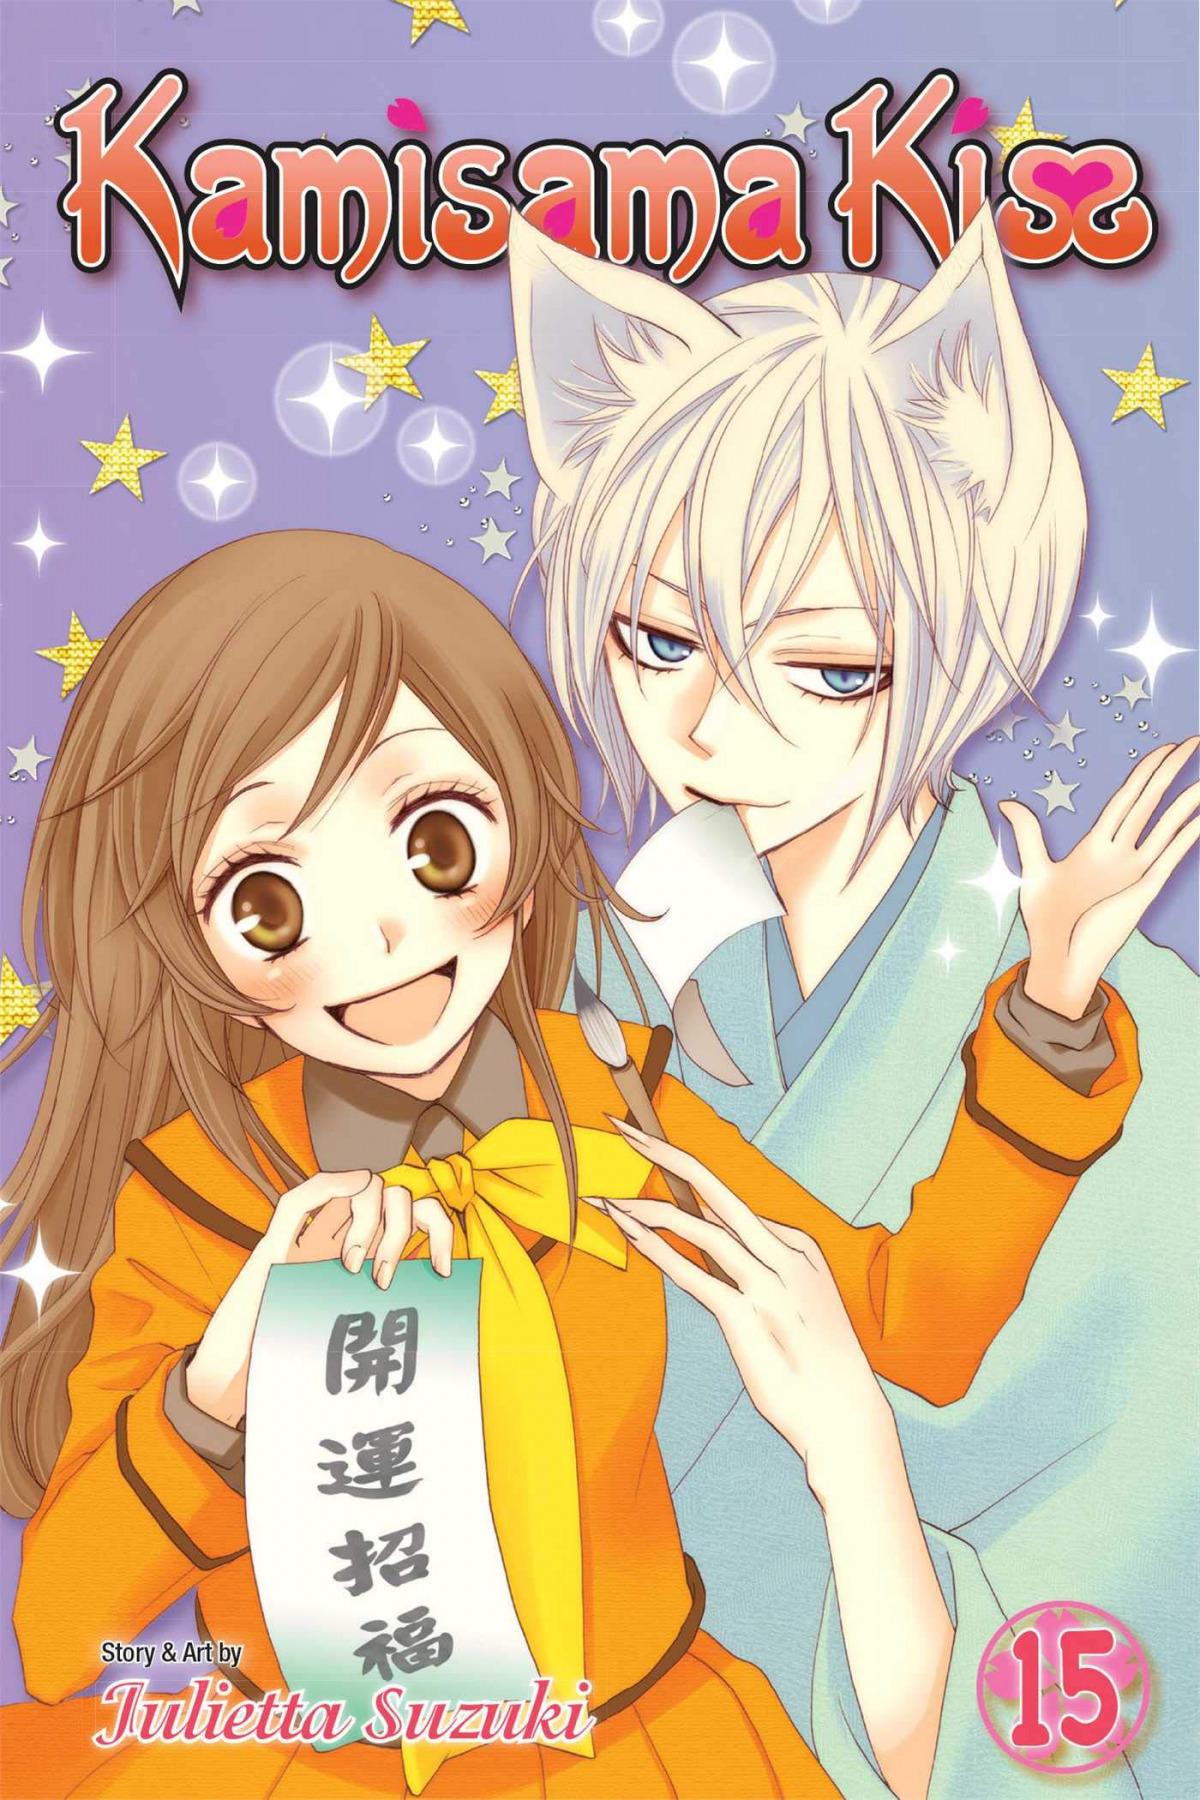 (suzuki).kamisama kiss 15 (simon and sch)